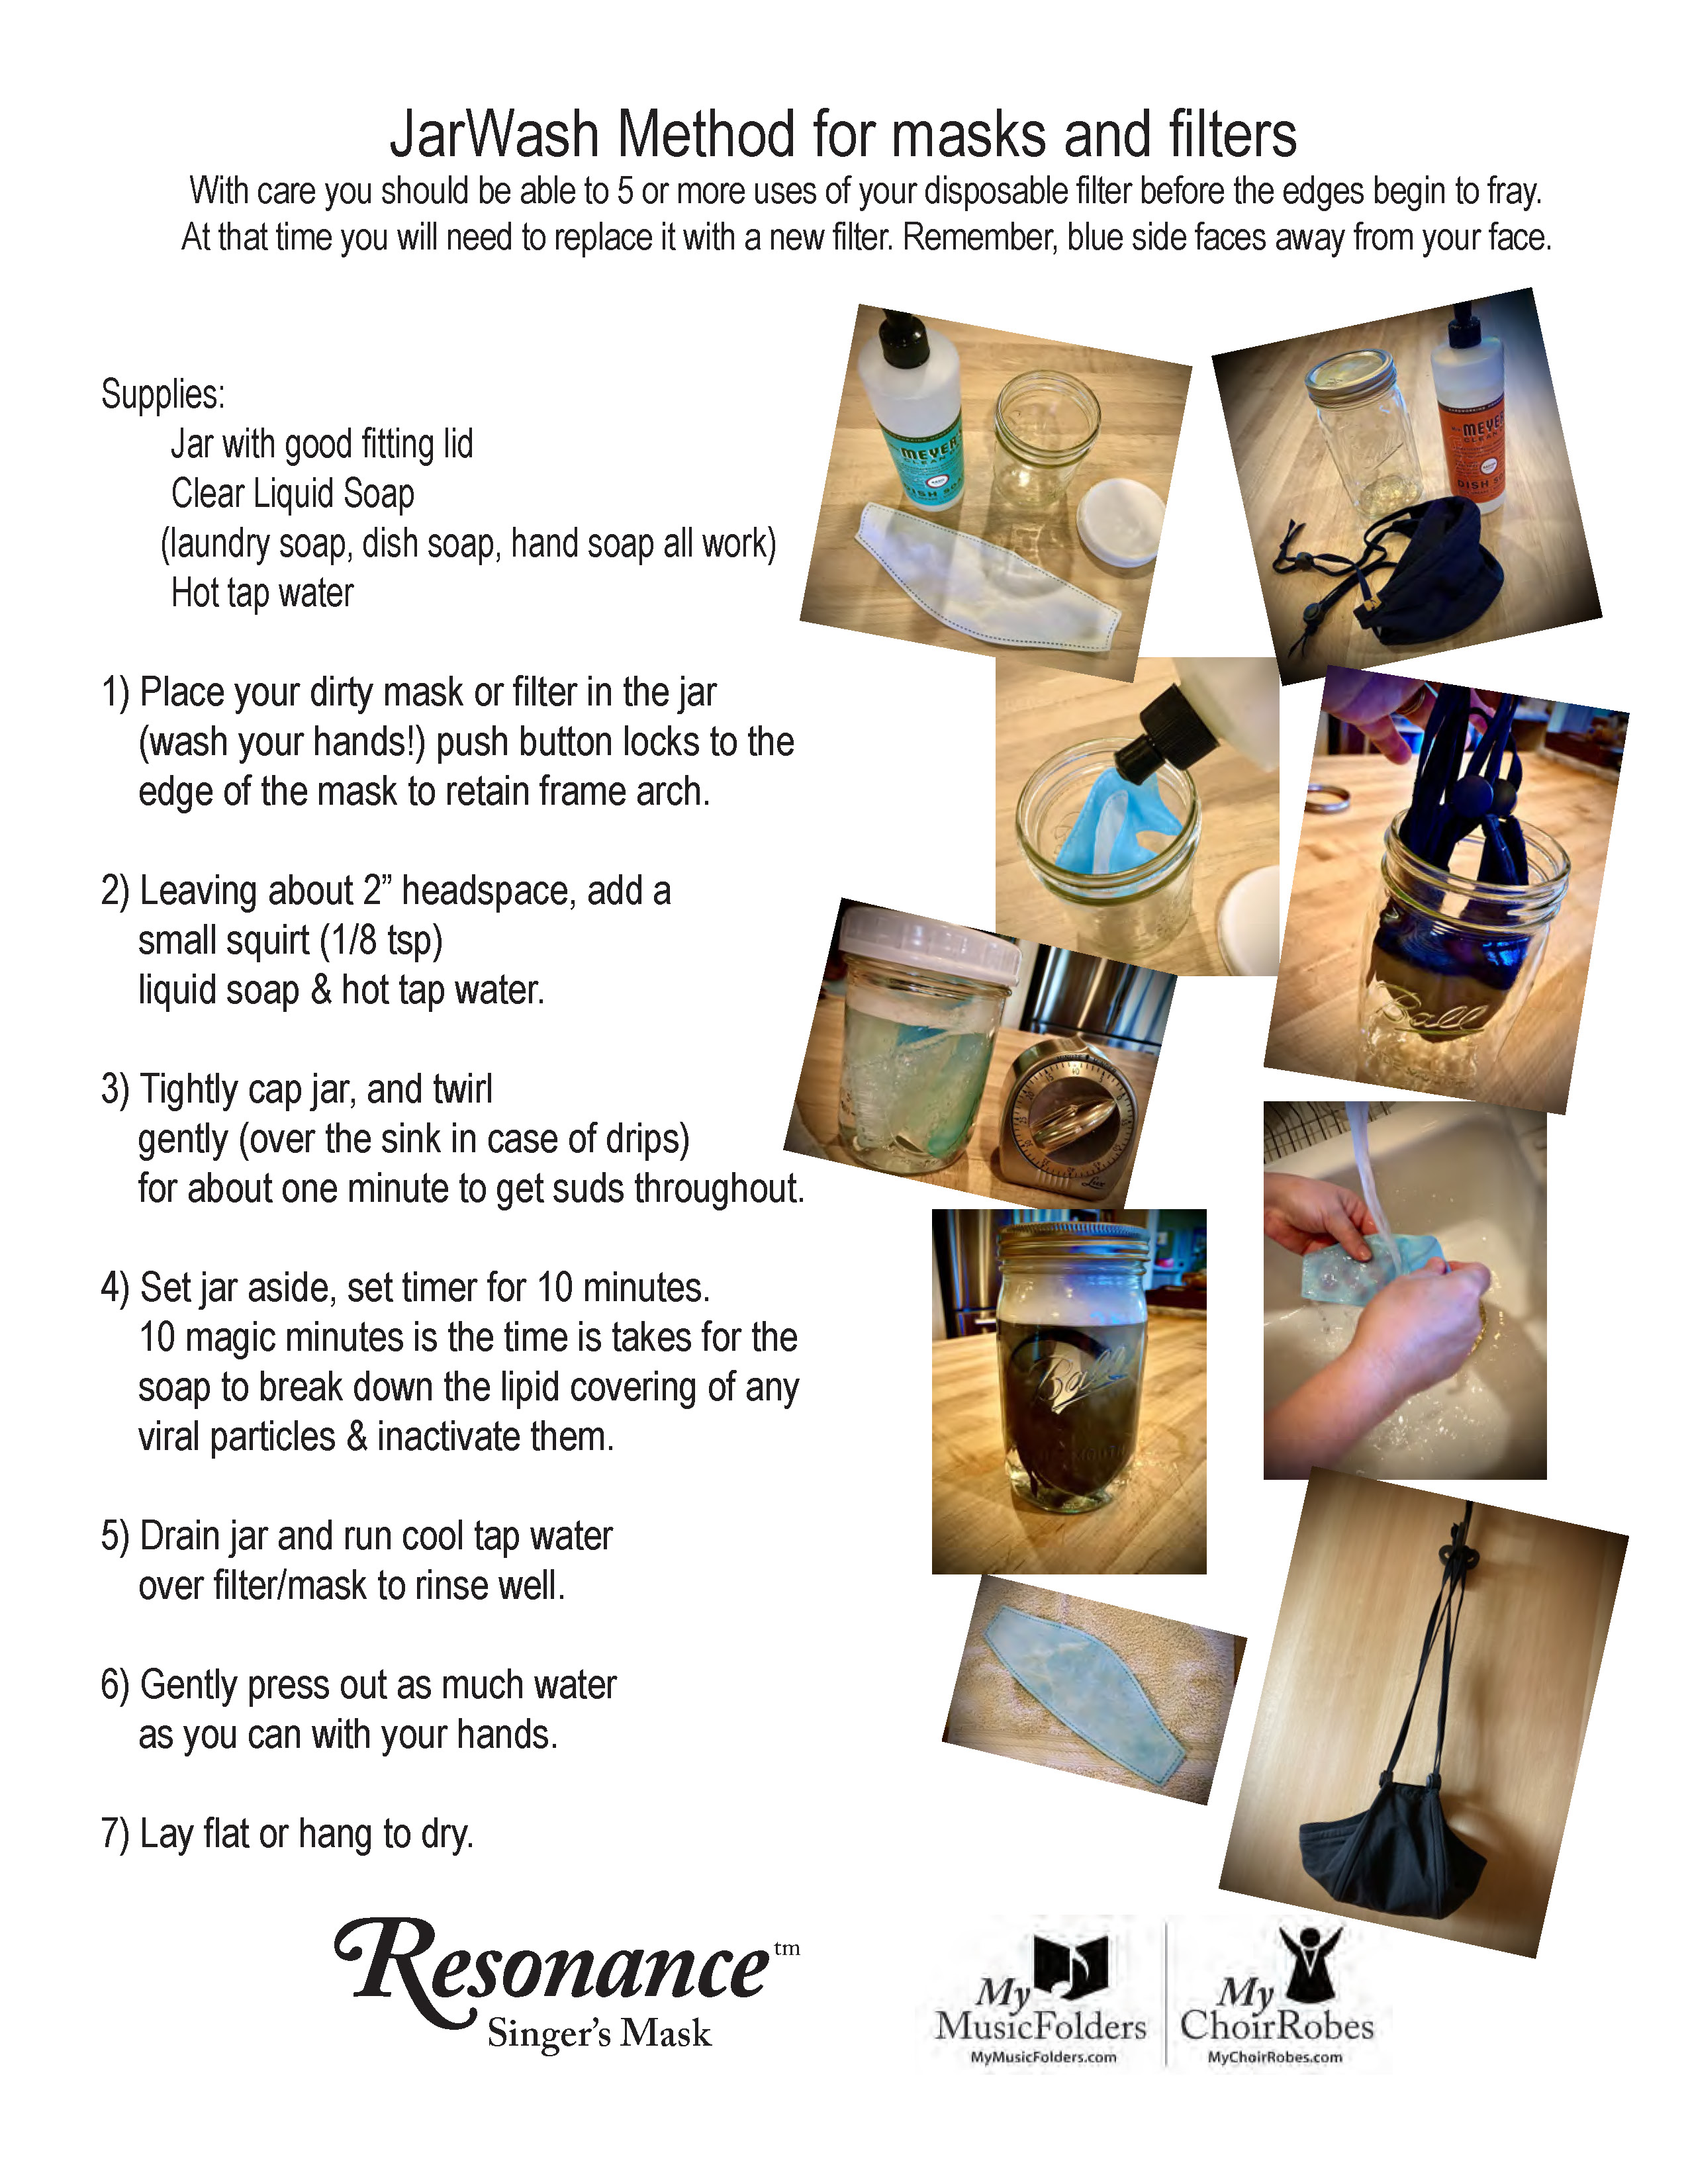 jarwash-method-instructions.jpg